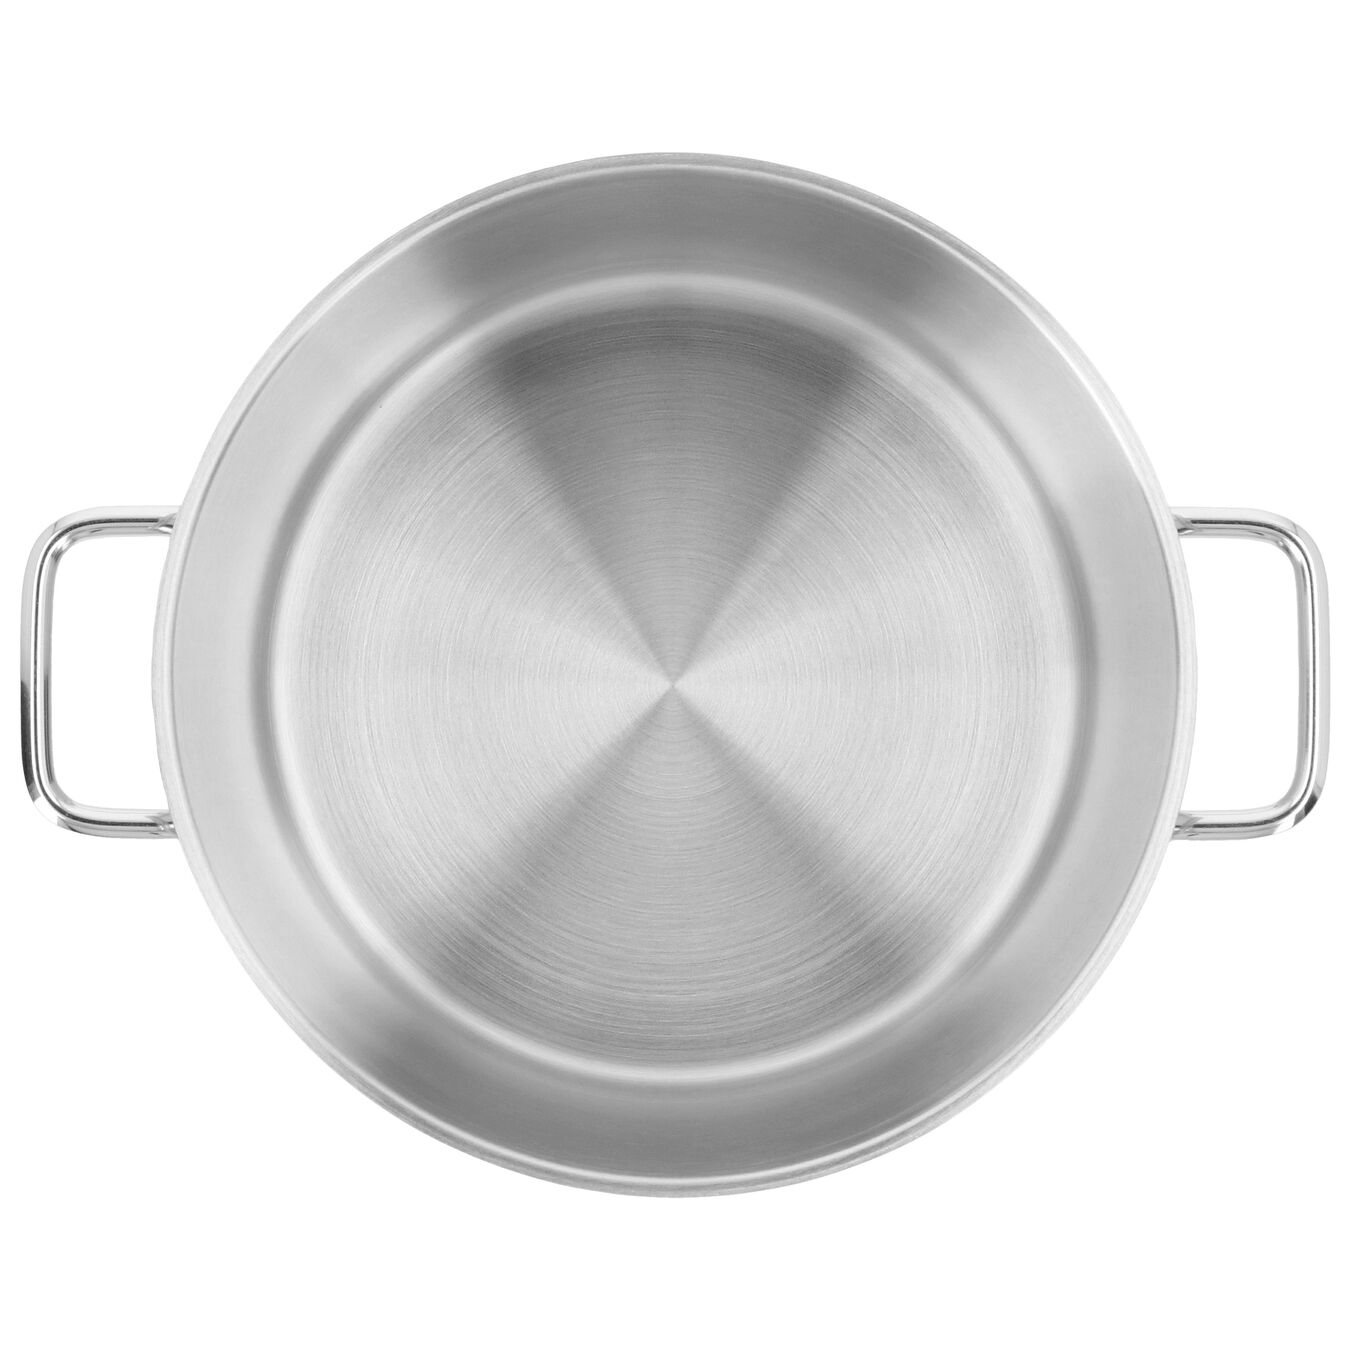 Kochtopf ohne Deckel 24 cm, 18/10 Edelstahl,,large 5